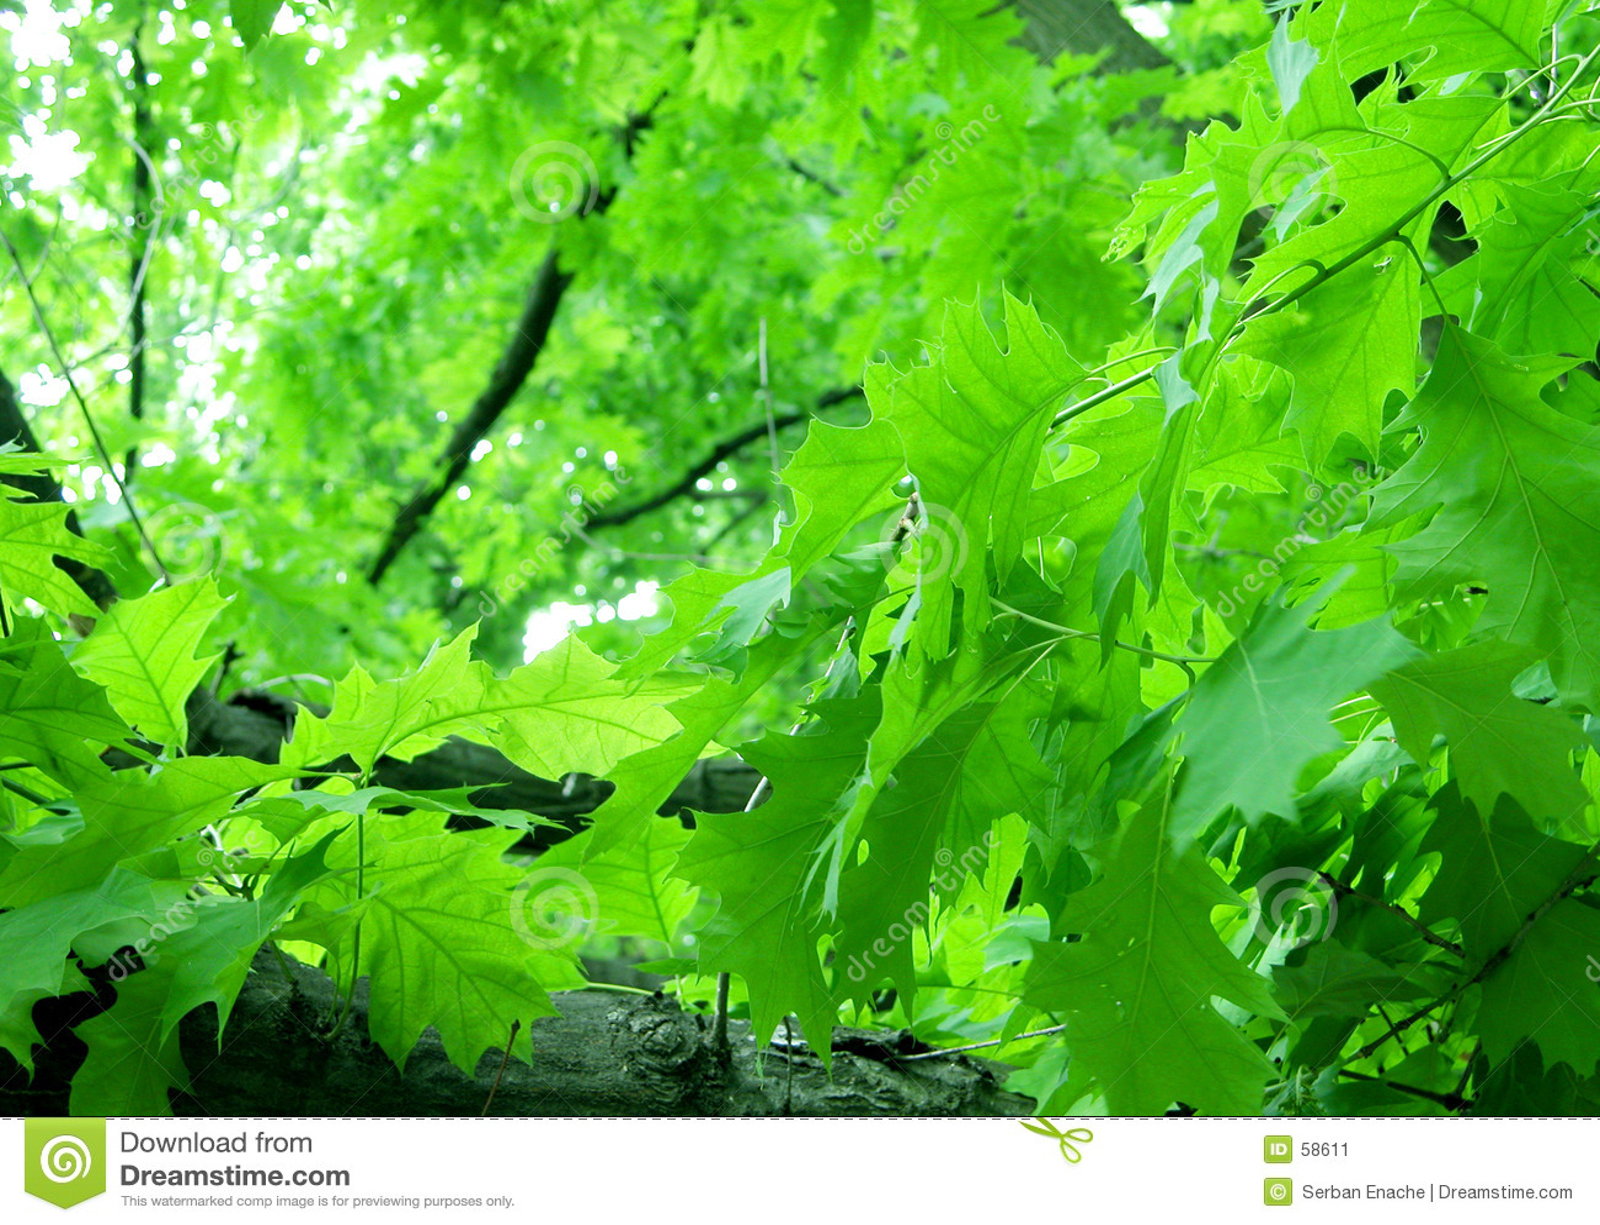 Download φύλλωμα πράσινο στοκ εικόνα. εικόνα από πράσινος, βαλανιδιά - 58611